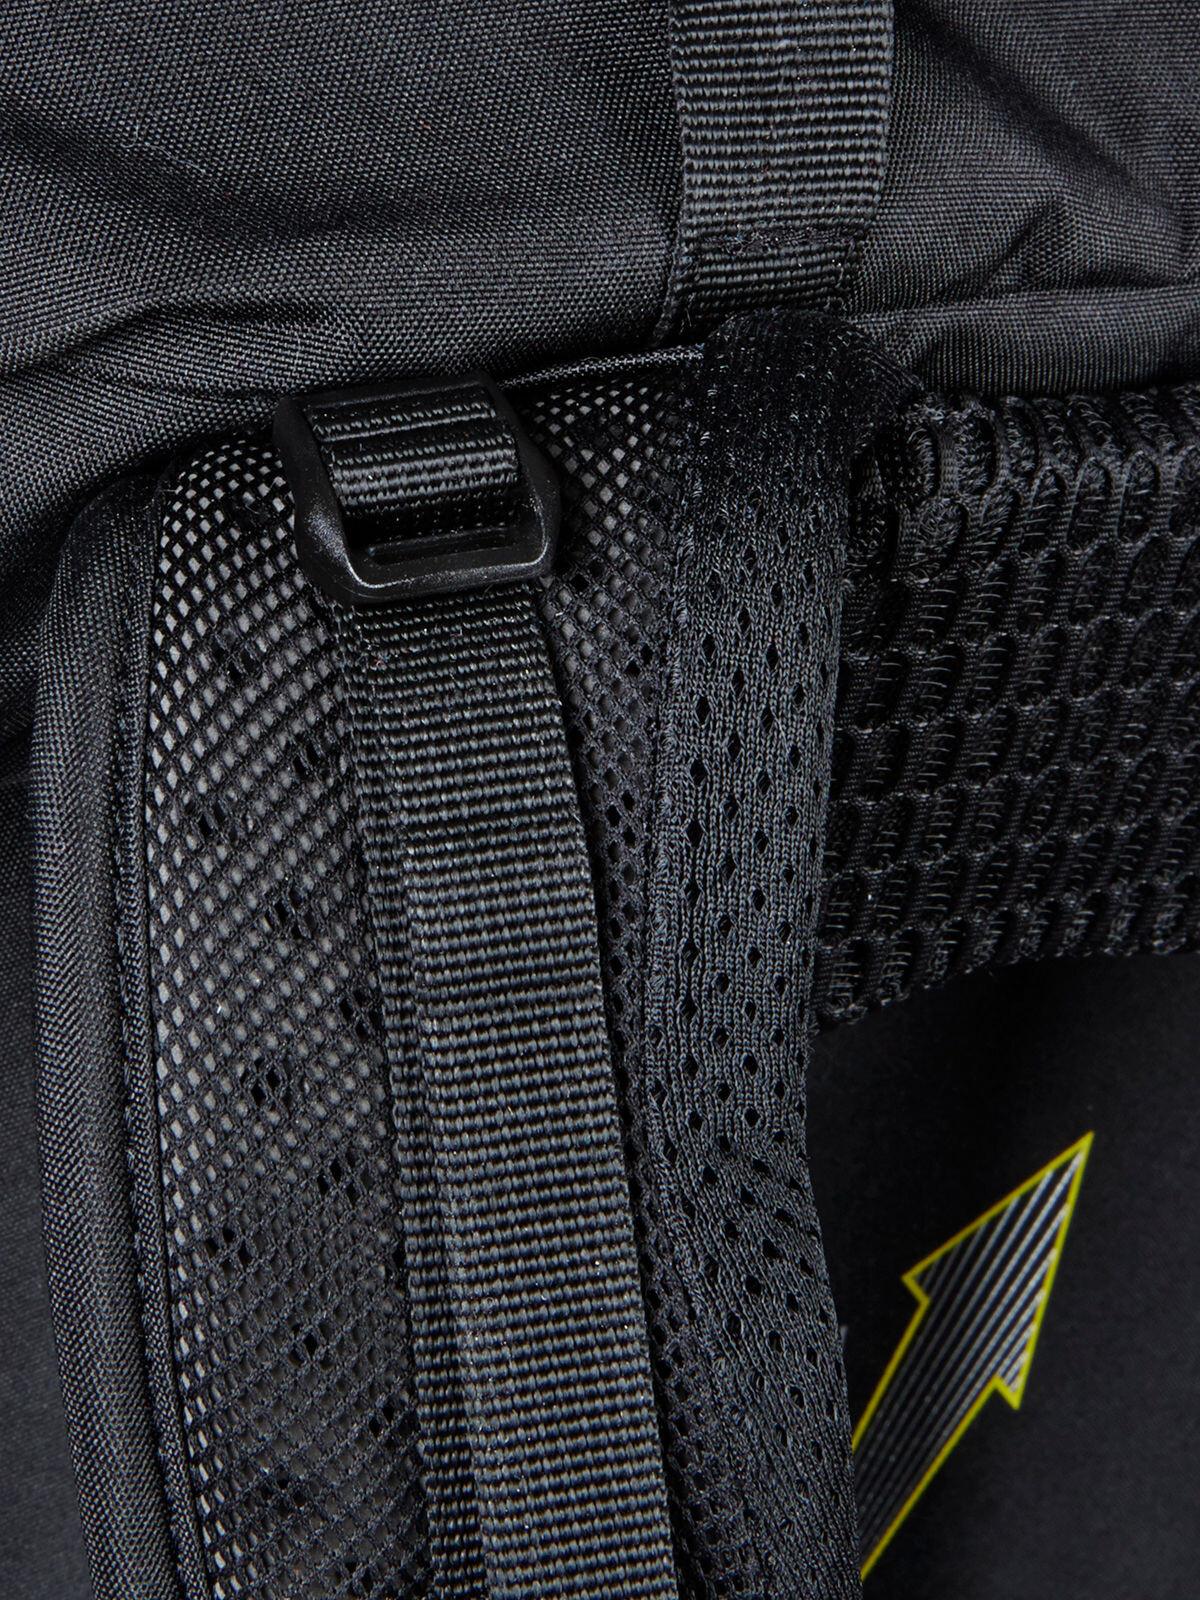 Berghaus Freeflow 35 Backpack black at Addnature.co.uk 0e2fa672f33b4